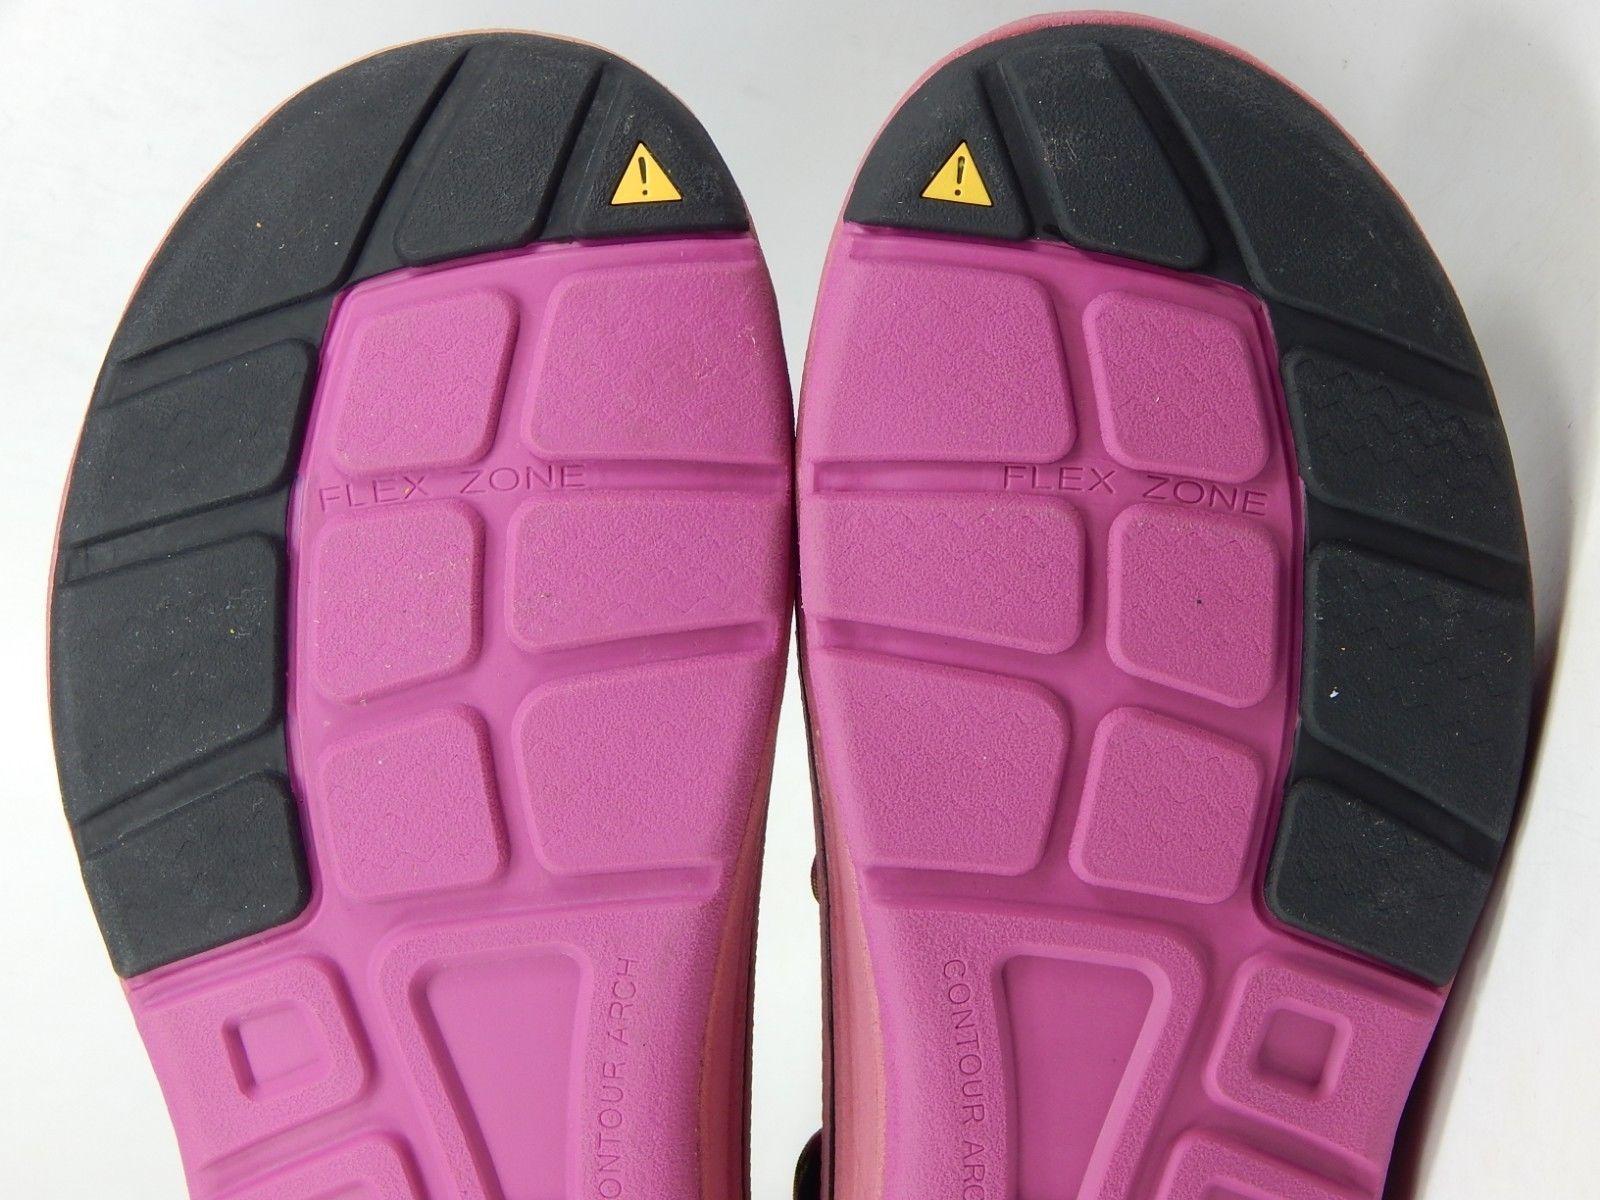 Keen Uneek Size 7.5 M (B) EU 38 Women's Sport Sandals Shoes Pink Dhalia 1013886